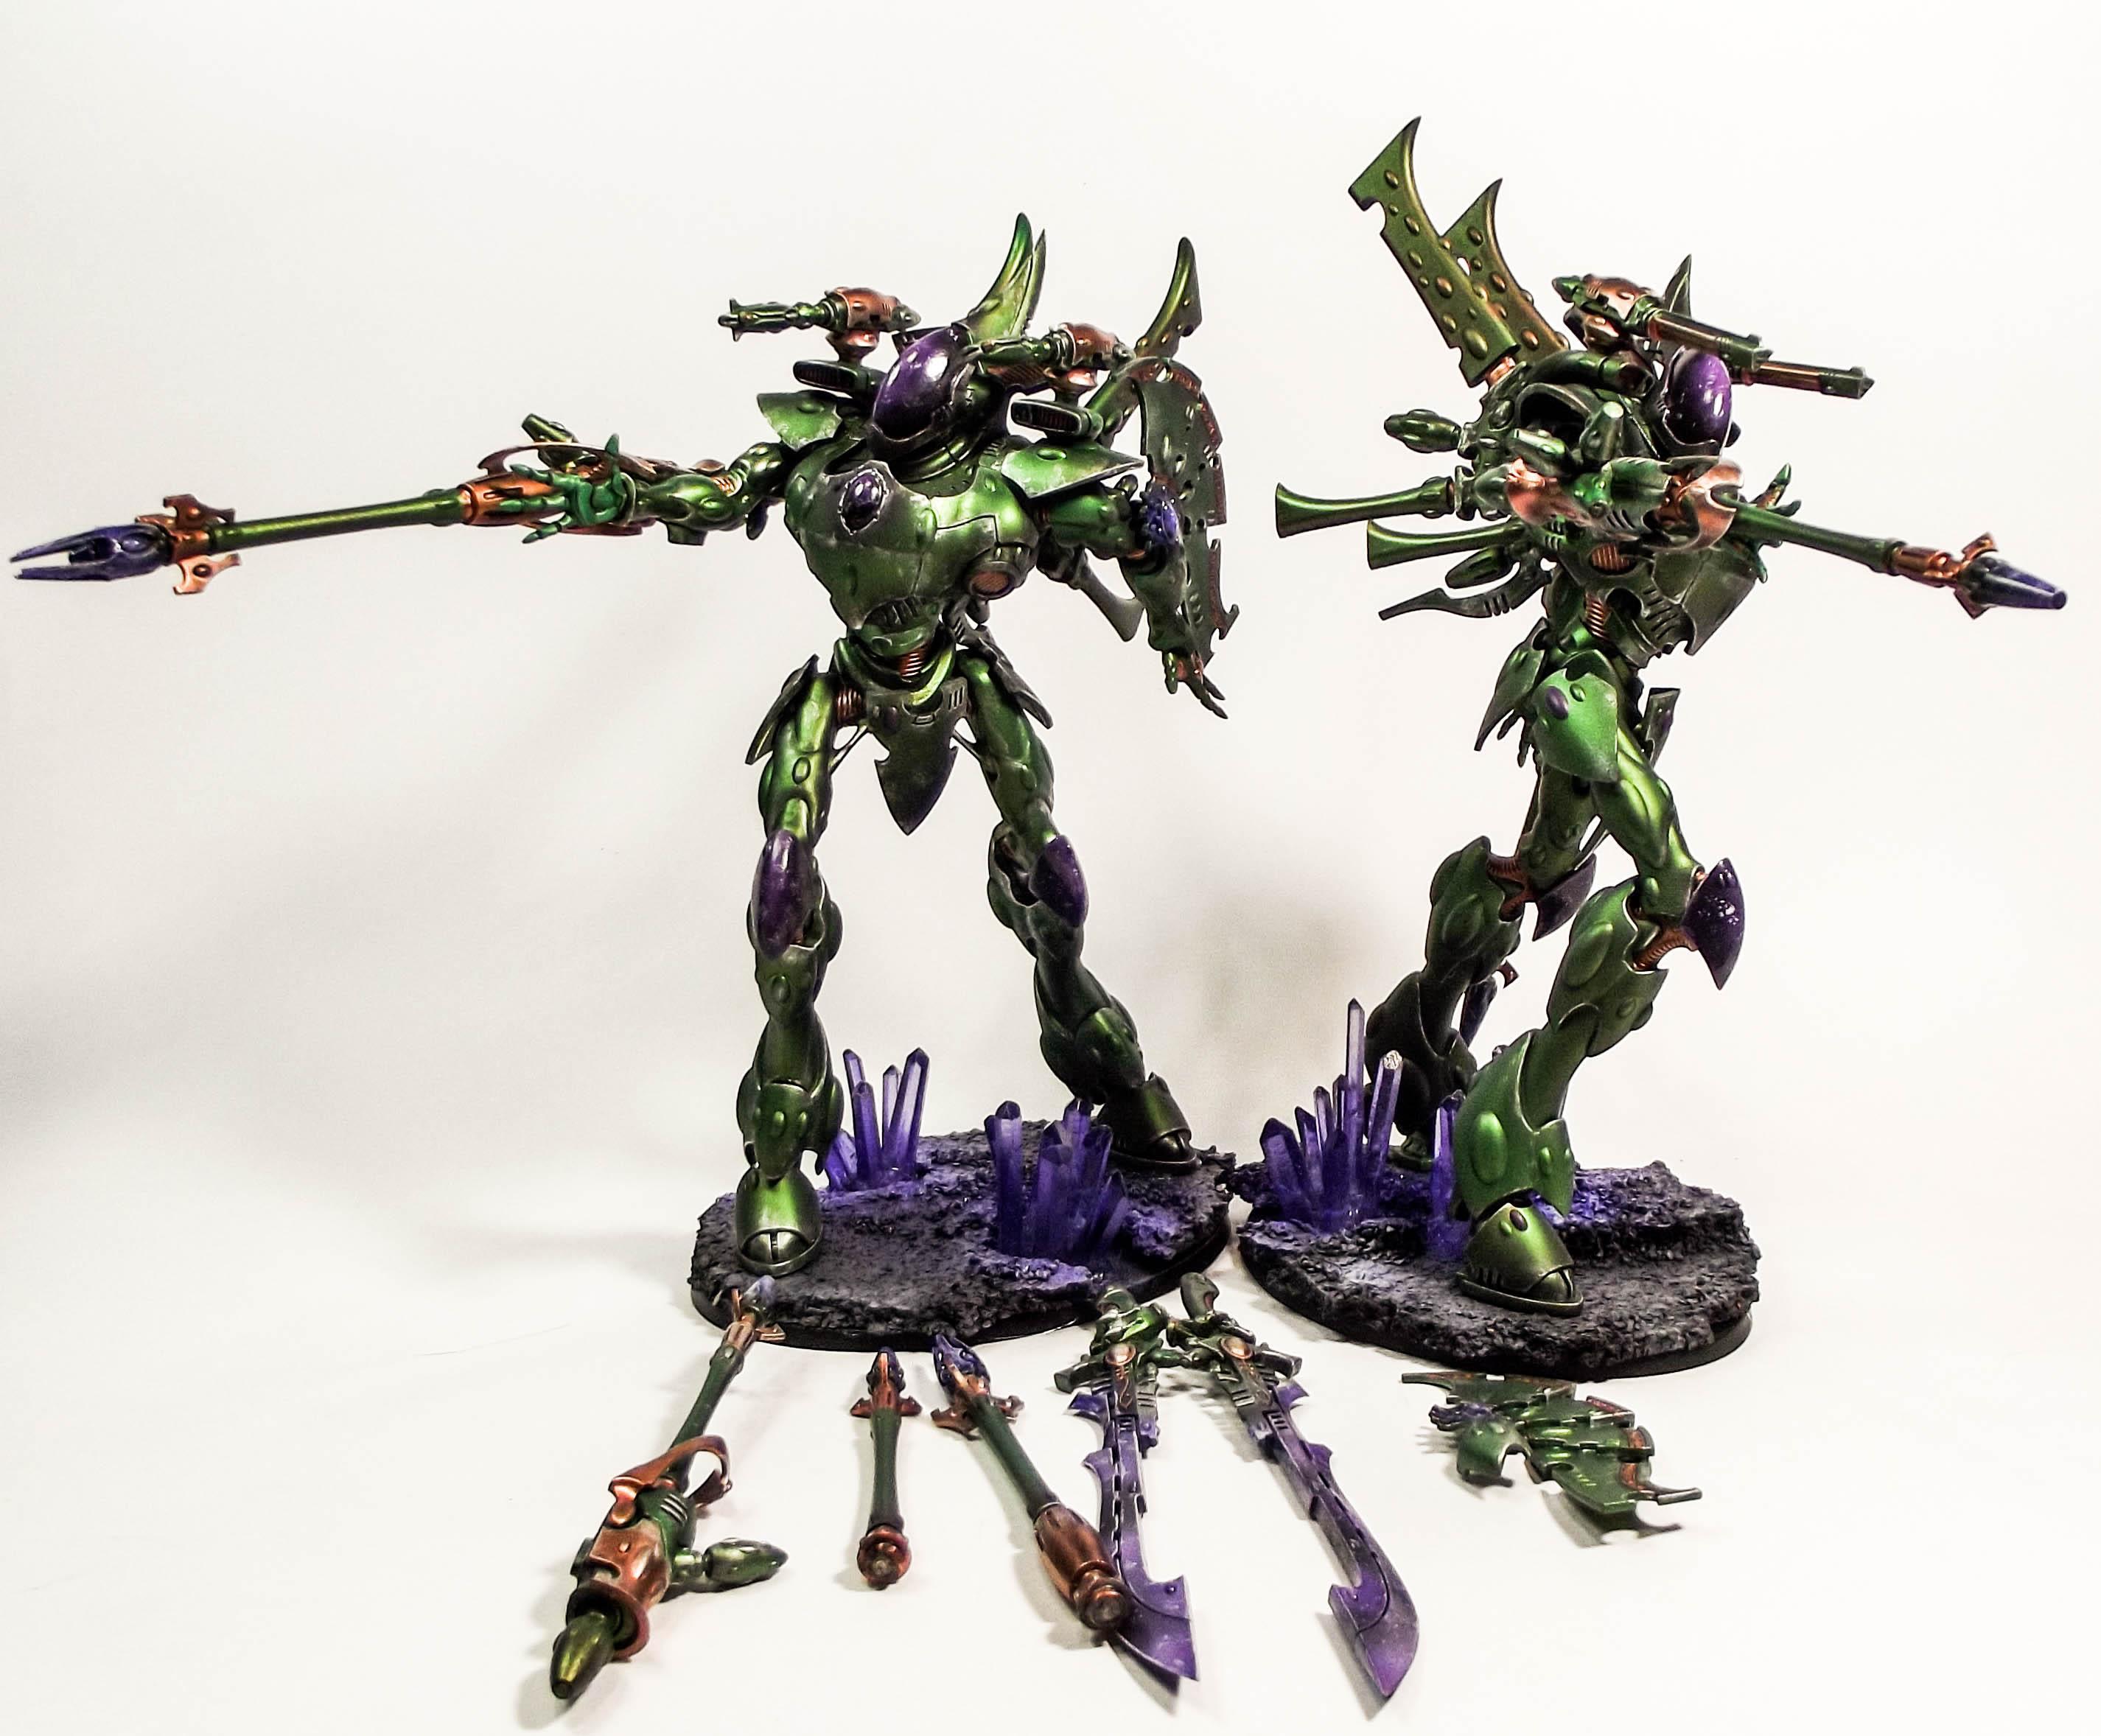 Eldar, Green, Metallic, Purple, Warhammer 40,000, Wraithknight